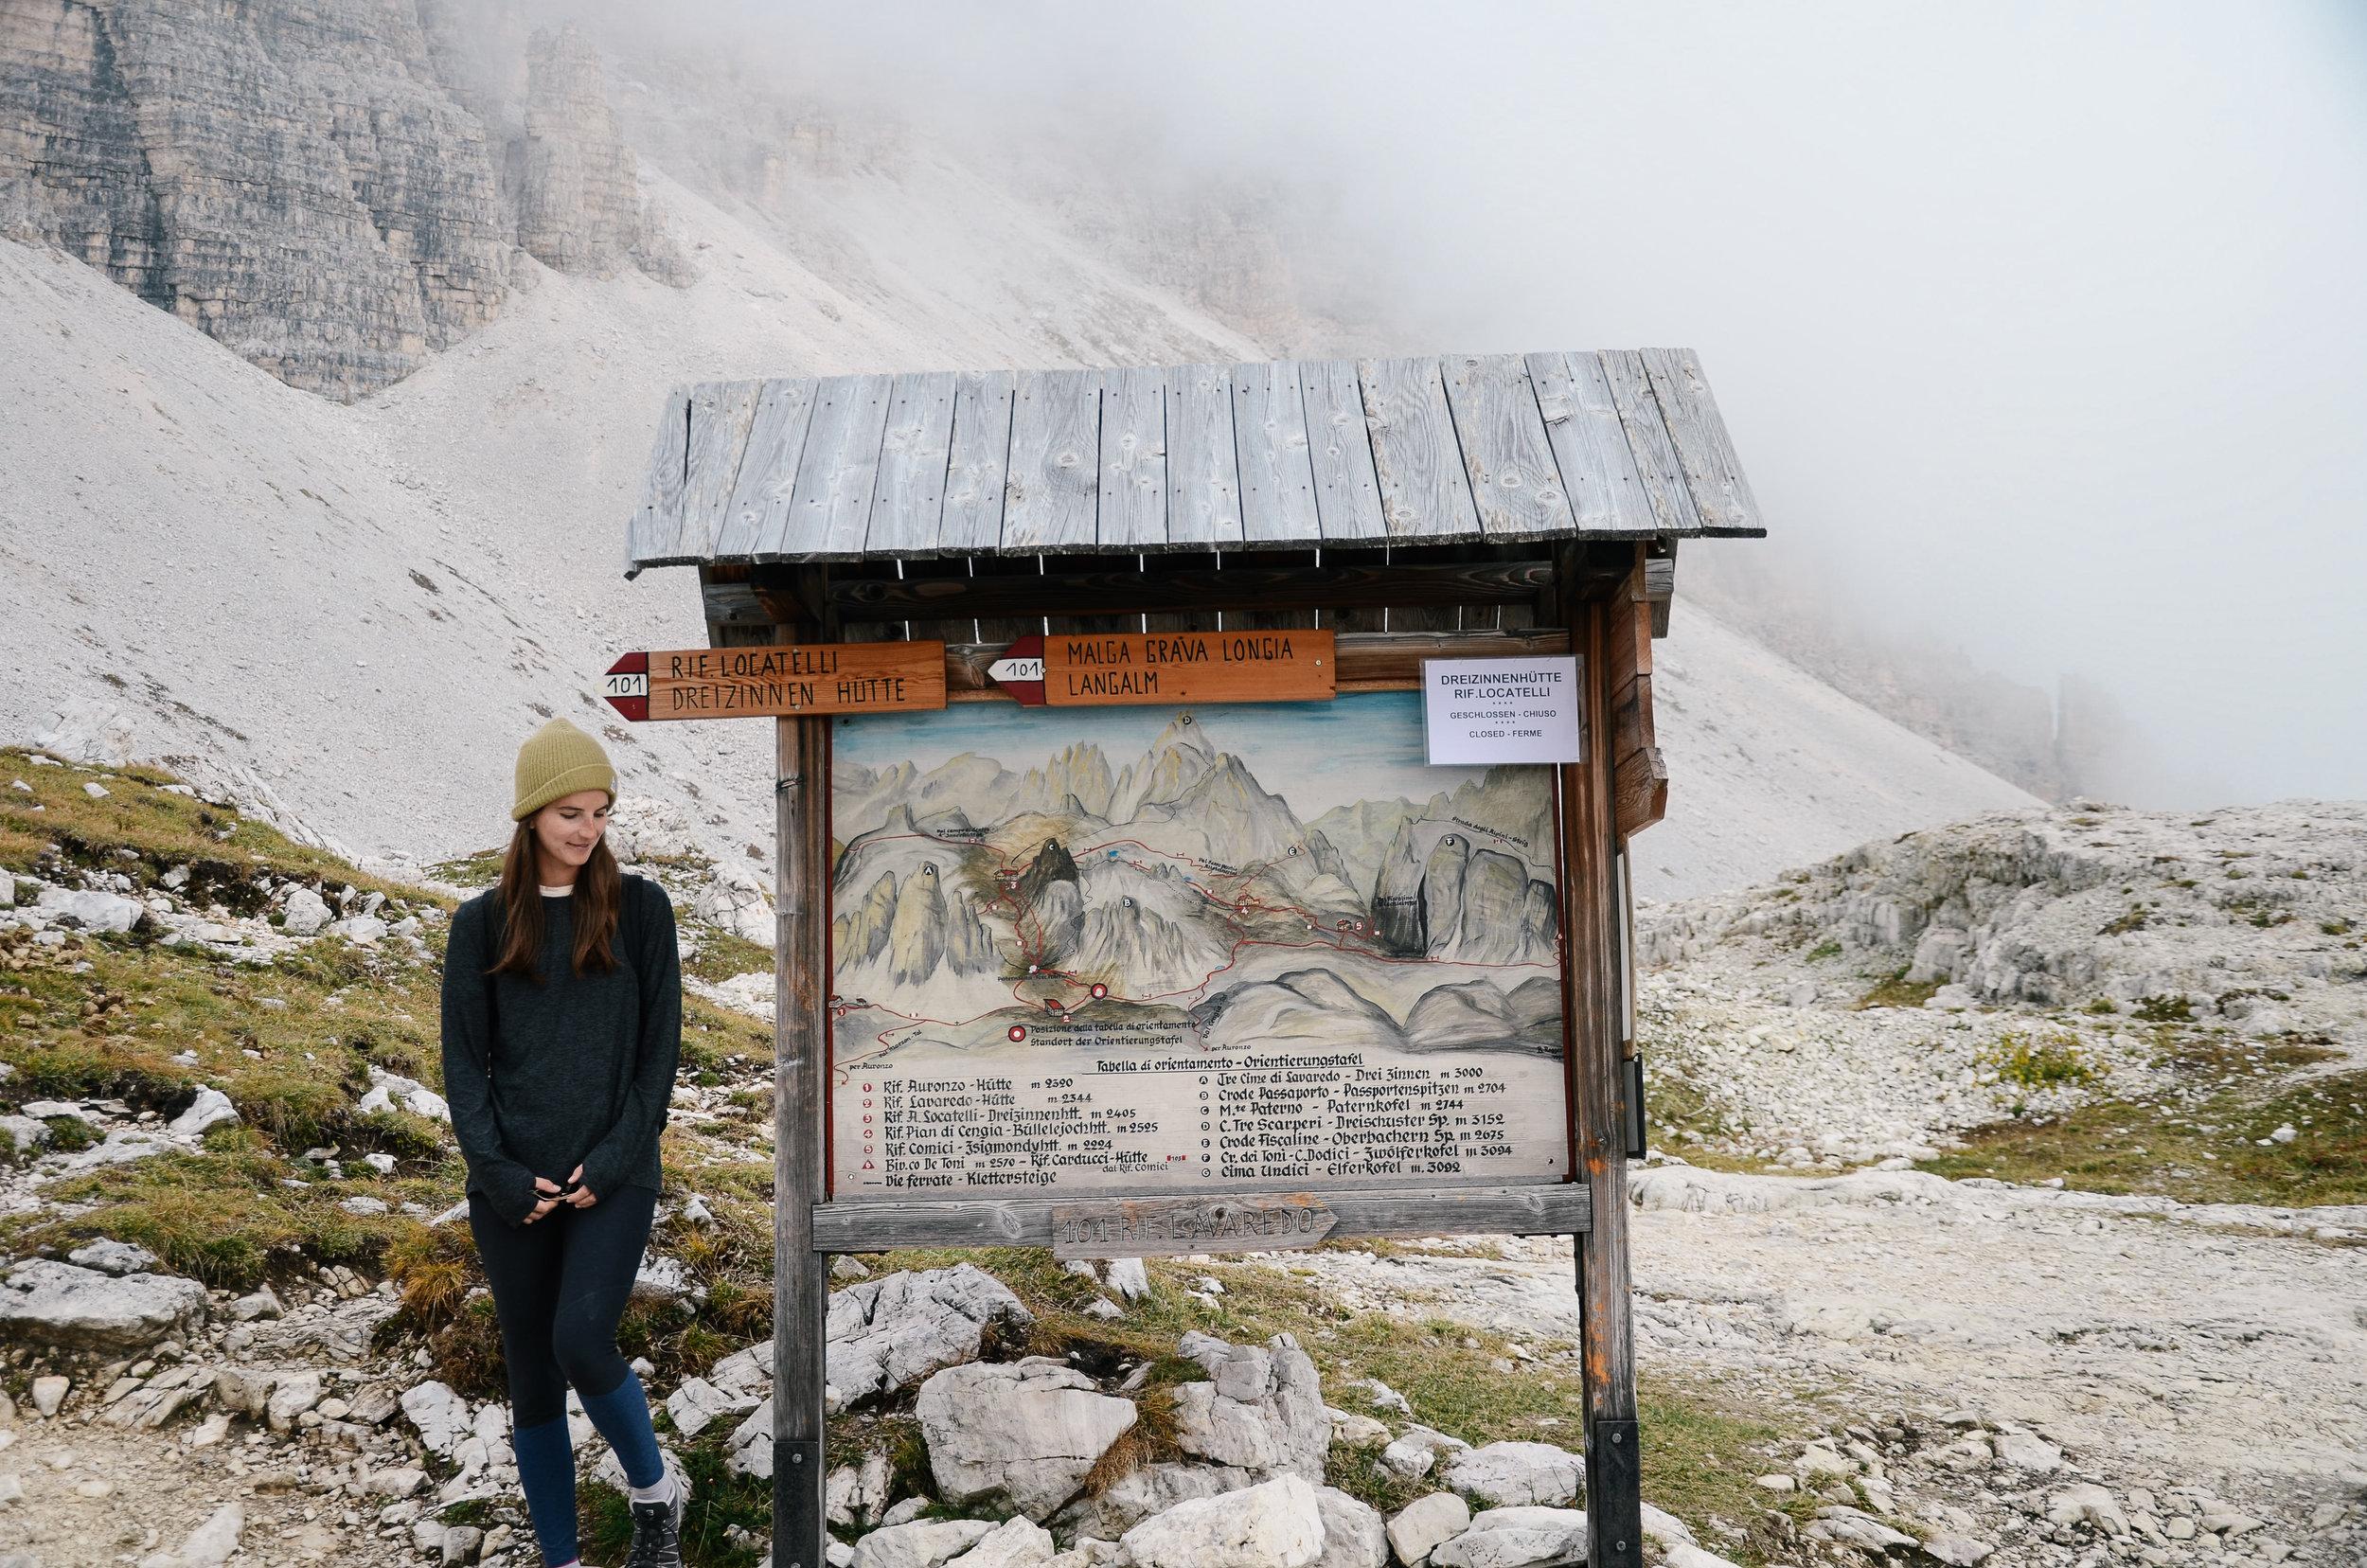 adventure-in-italy-3-hikes-dolomites-hiking-travel-blog-tyrol-16.jpg